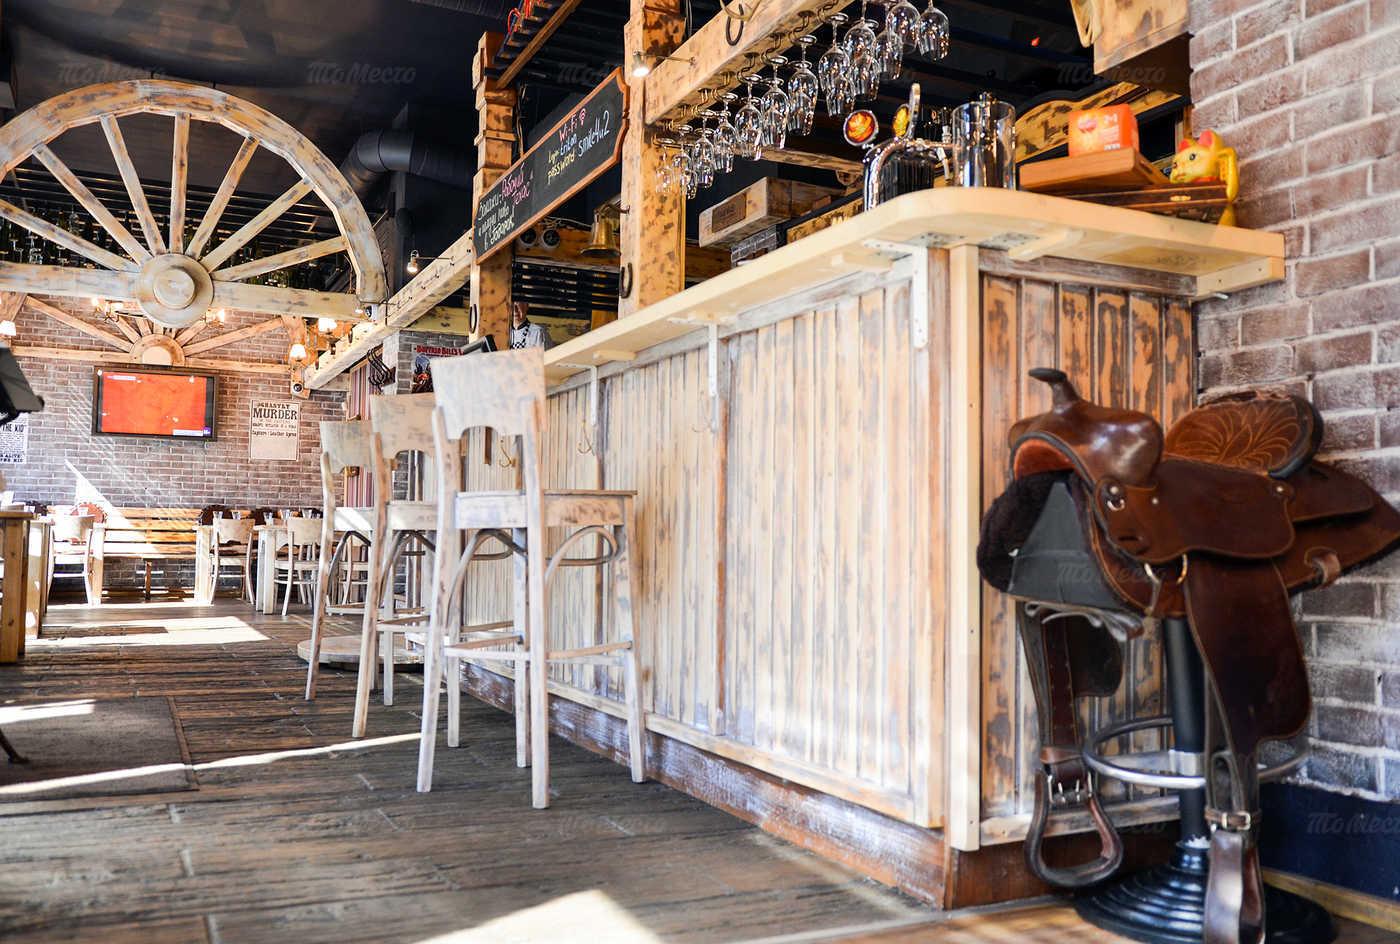 Ресторан Монтана (Montana saloon) на Кирочной улице фото 23